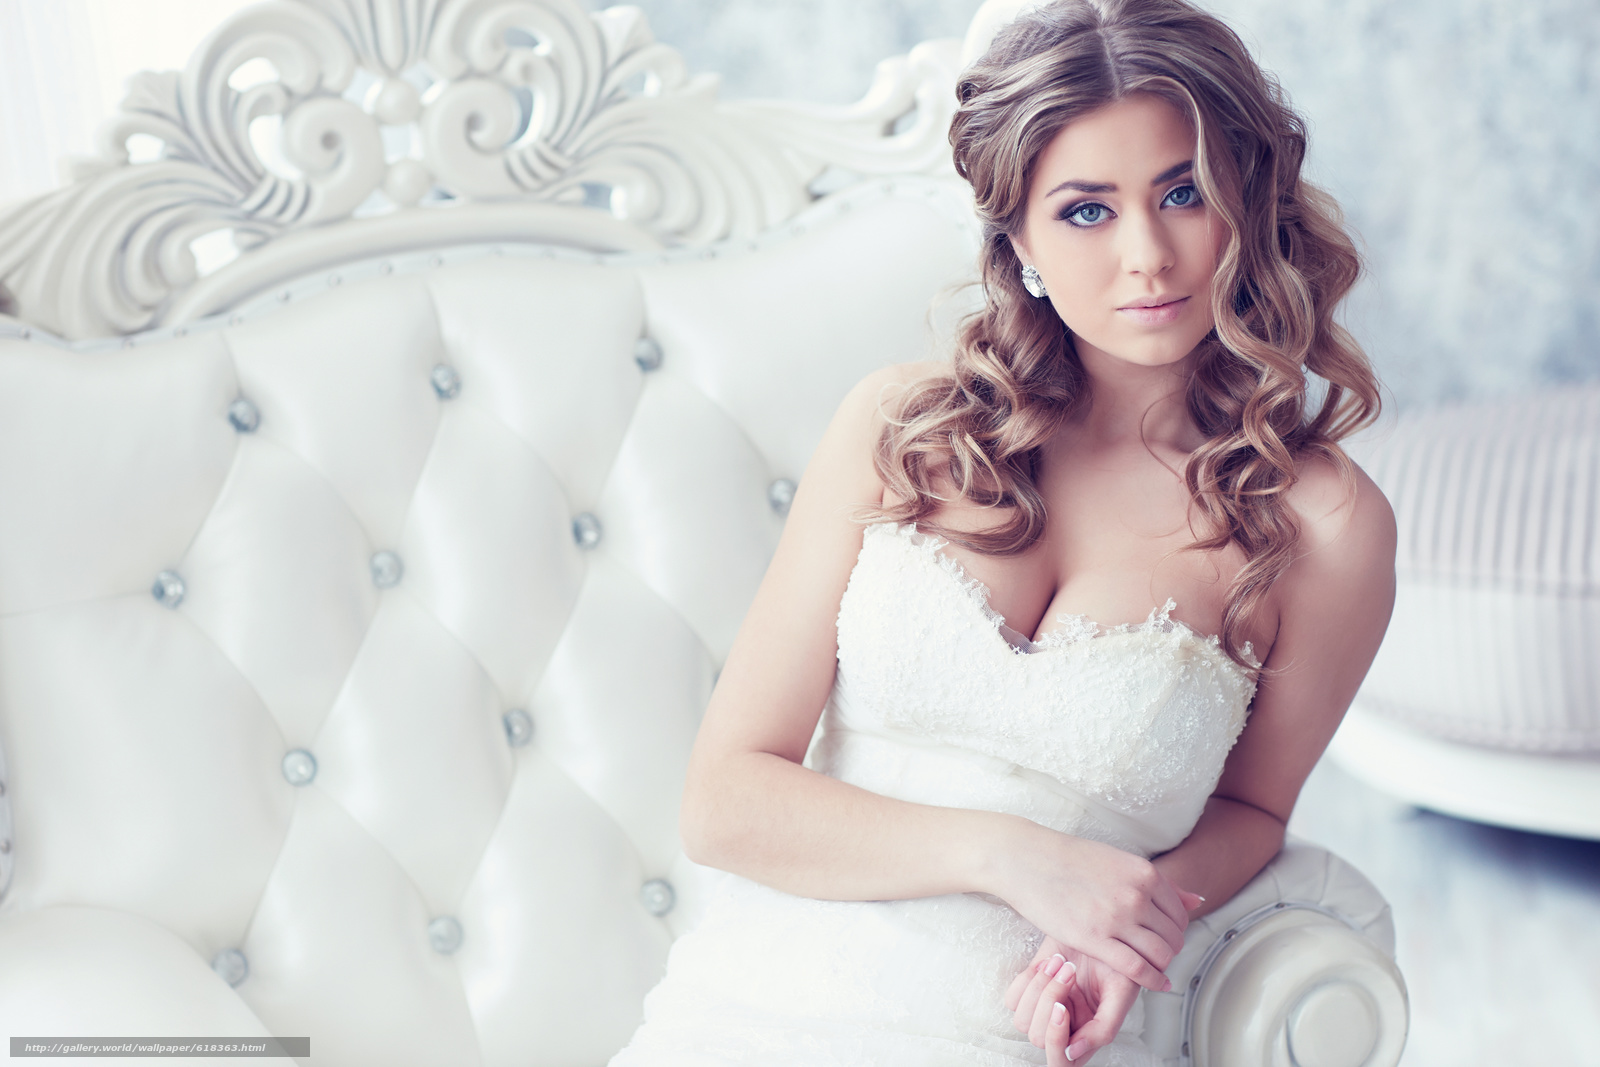 Екатерина Климова фейки  порно фото  подделки